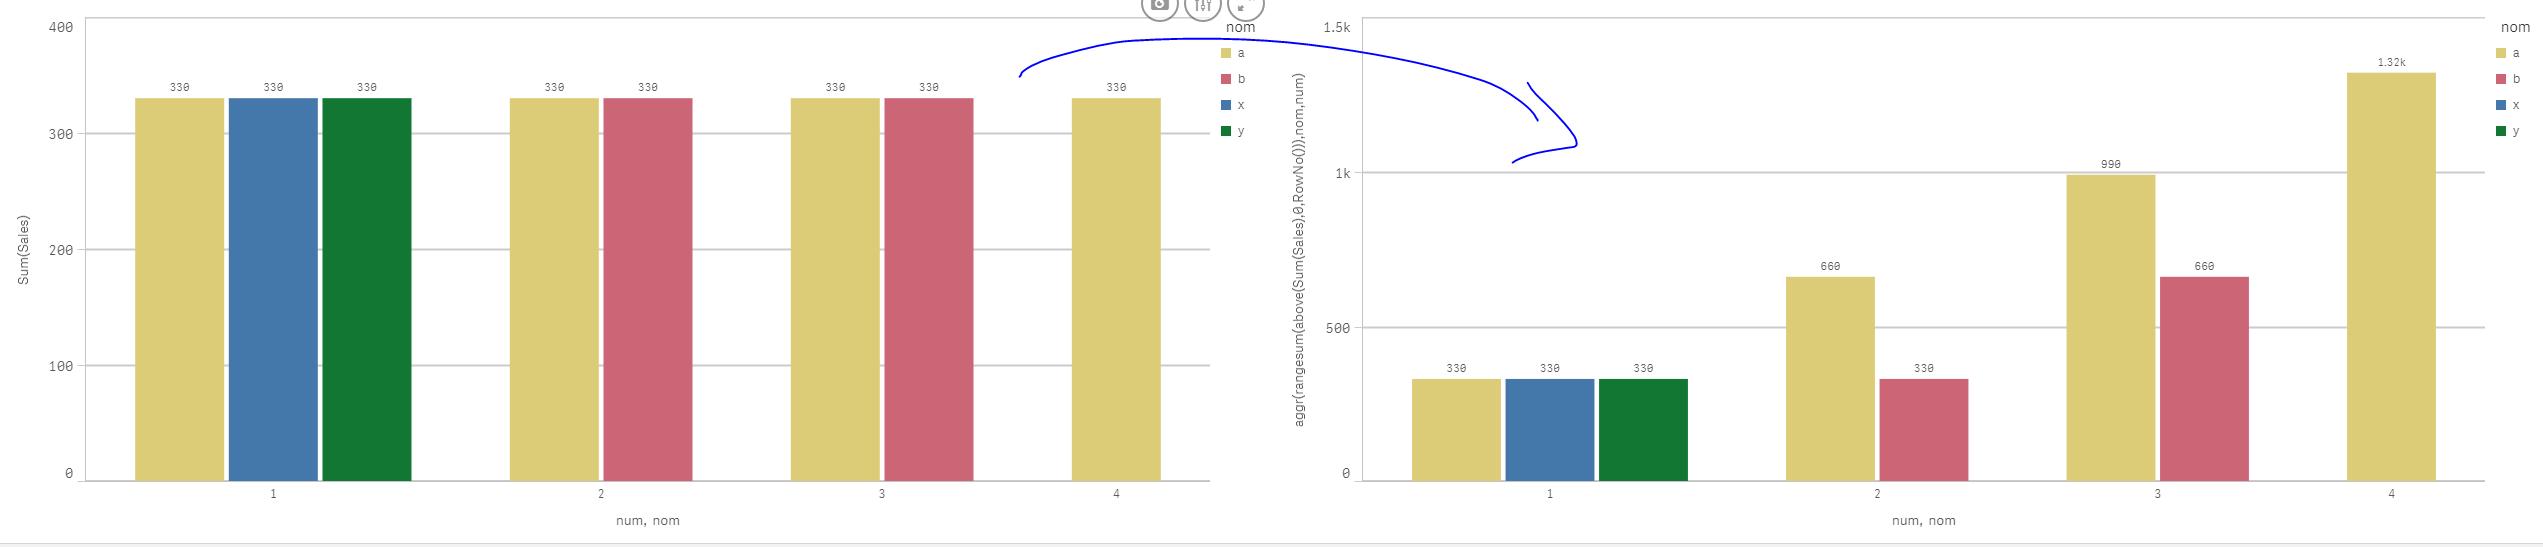 Solved: cumulative sum in bar chart - Qlik Community